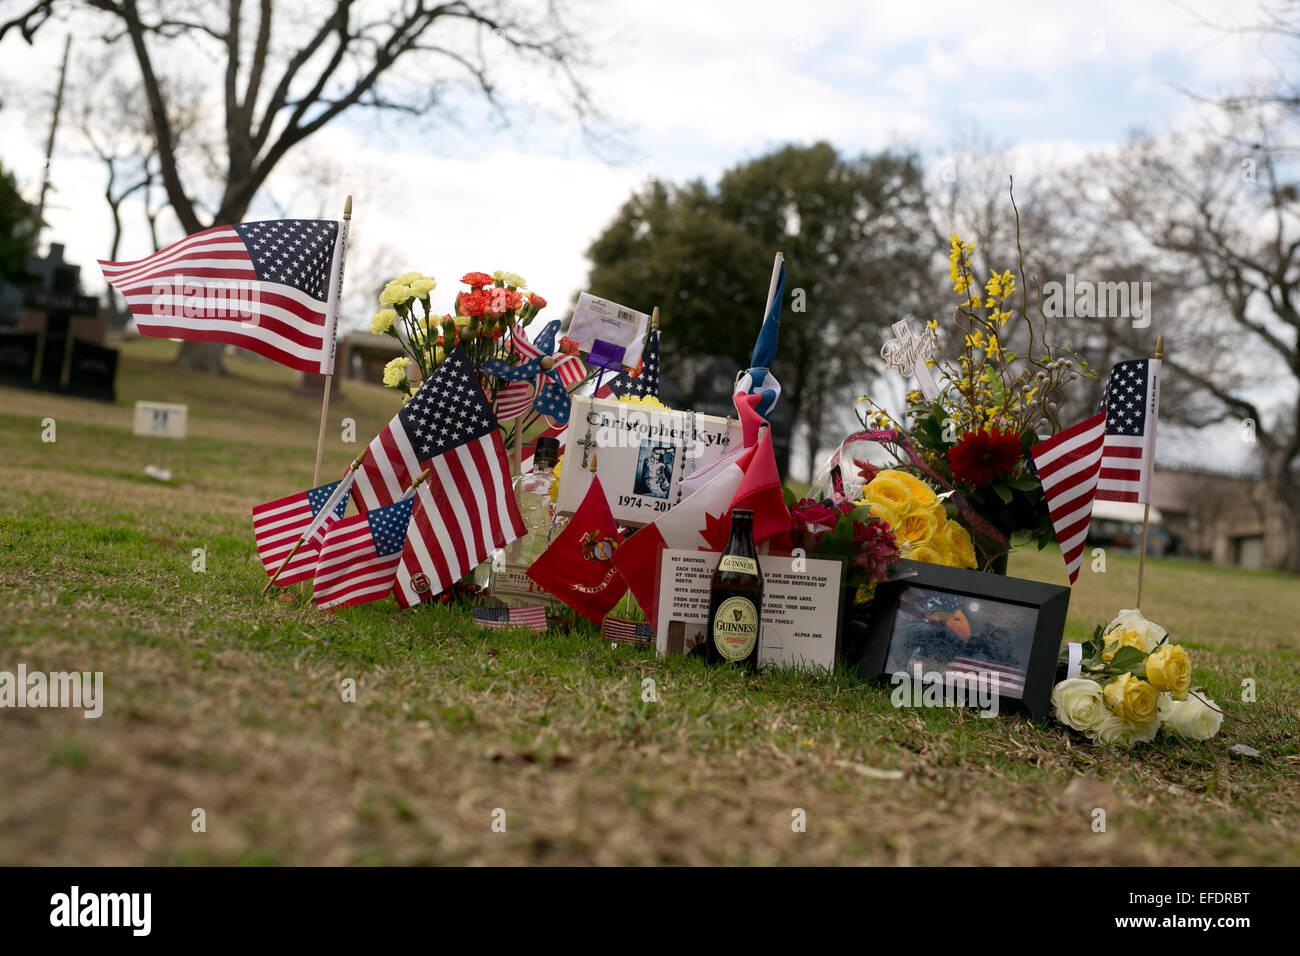 Austin, Texas, USA  1st February, 2015  Memorabilia adorns the Texas